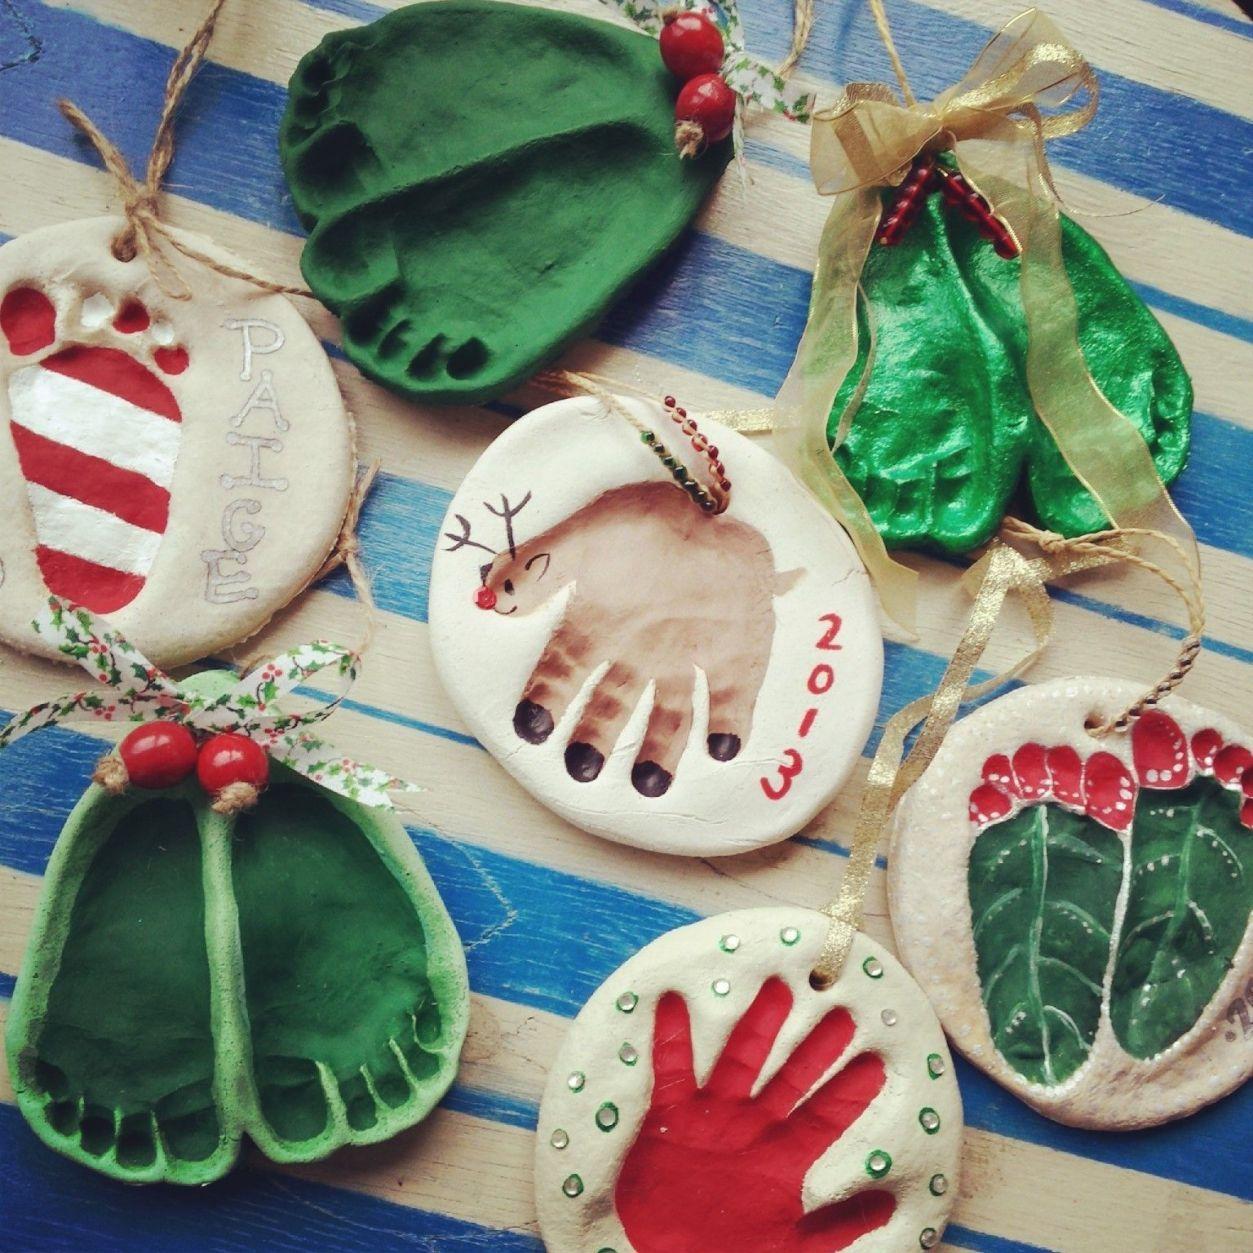 Christmas Salt Dough 191 Photos Christmas Crafts Christmas Crafts For Kids Handmade Christmas Decorations